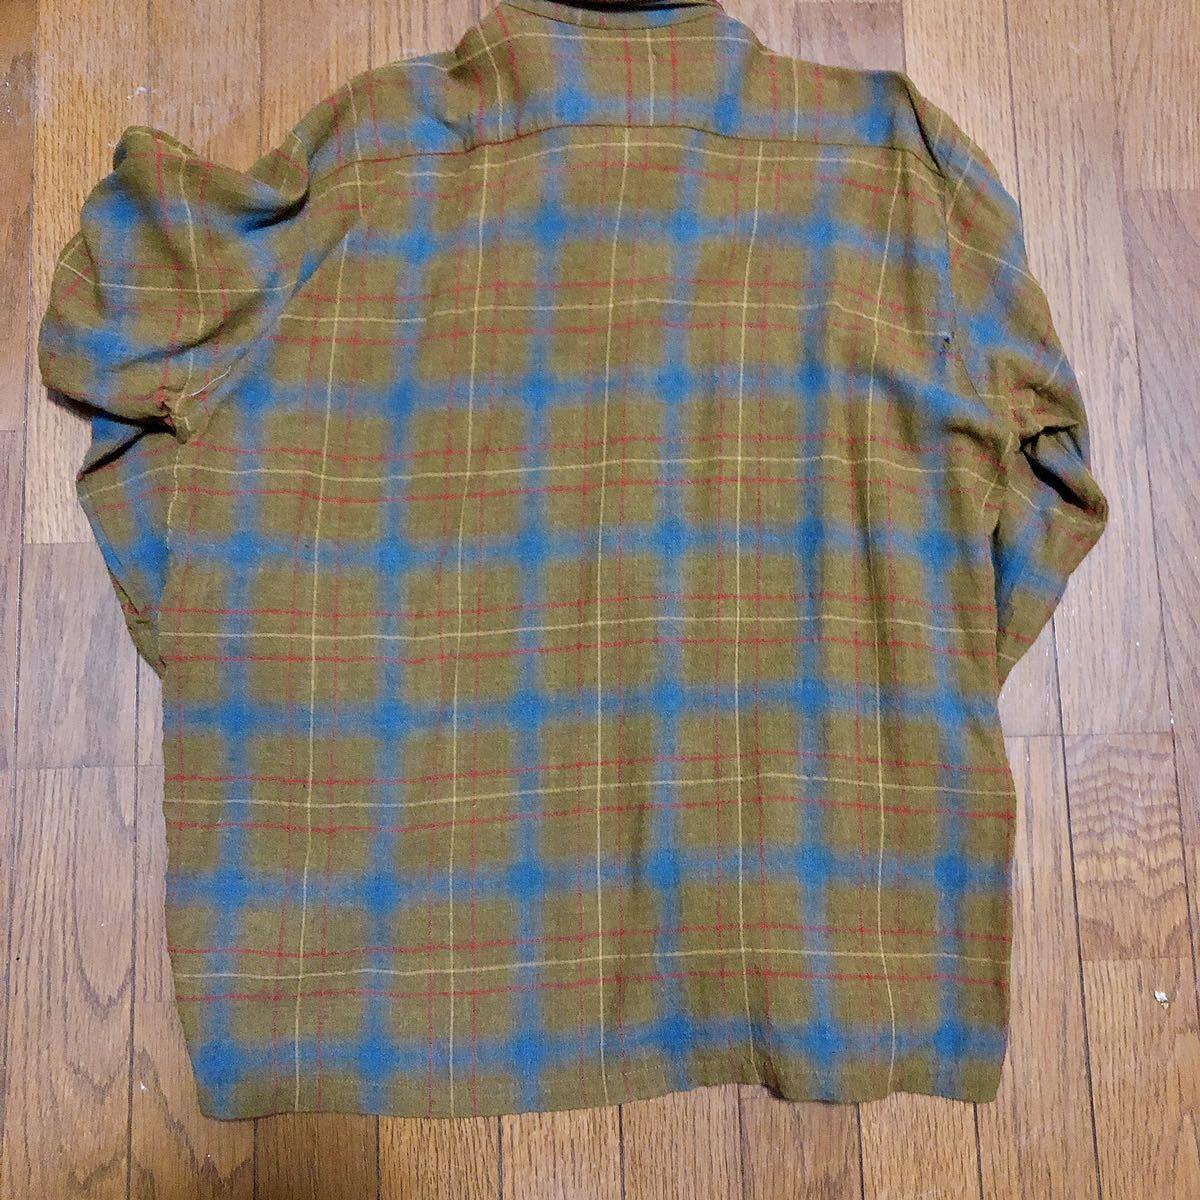 Vintage レーヨン チェックシャツ XL 長袖シャツ チェックシャツ ビンテージ タウンクラフト_画像2